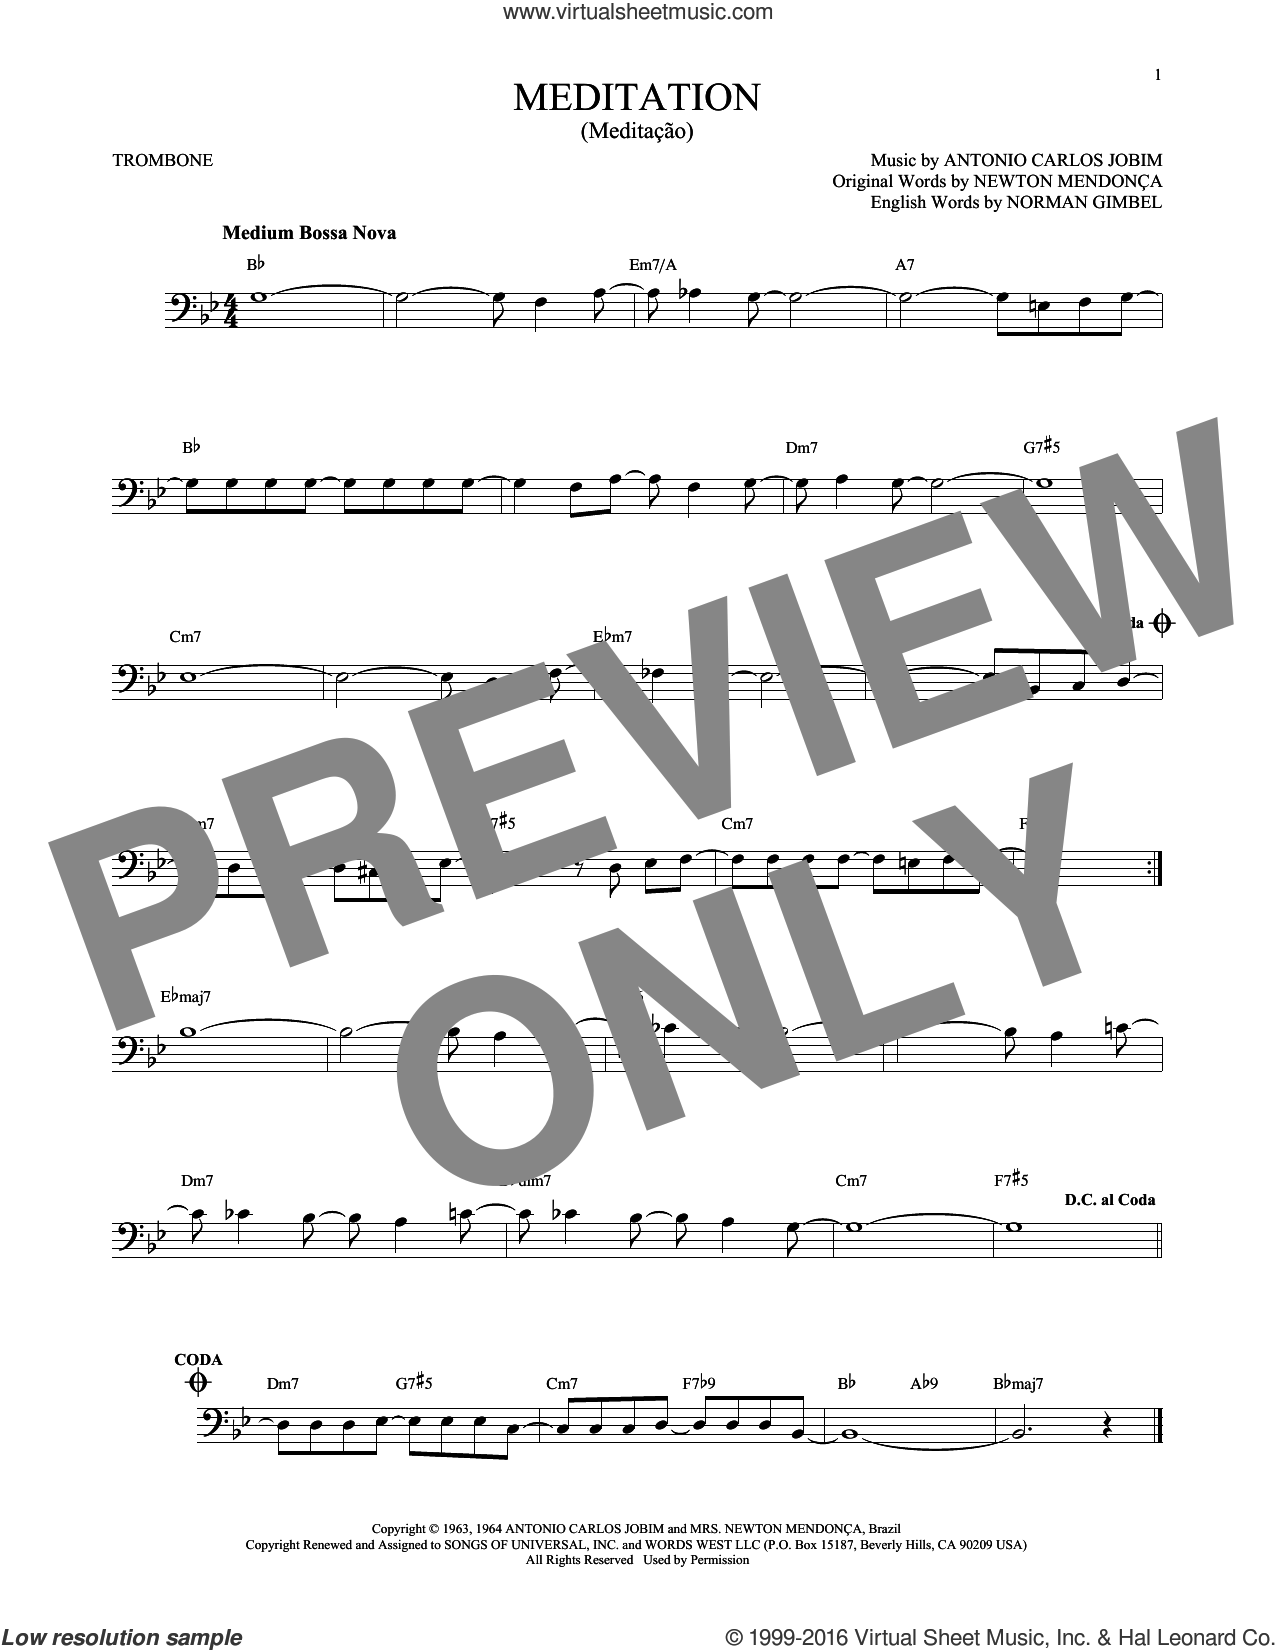 Meditation (Meditacao) sheet music for trombone solo by Norman Gimbel, Charlie Byrd w/The Walter Raim Strings, Antonio Carlos Jobim, Newton Mendonça and Newton Mendonca, intermediate skill level